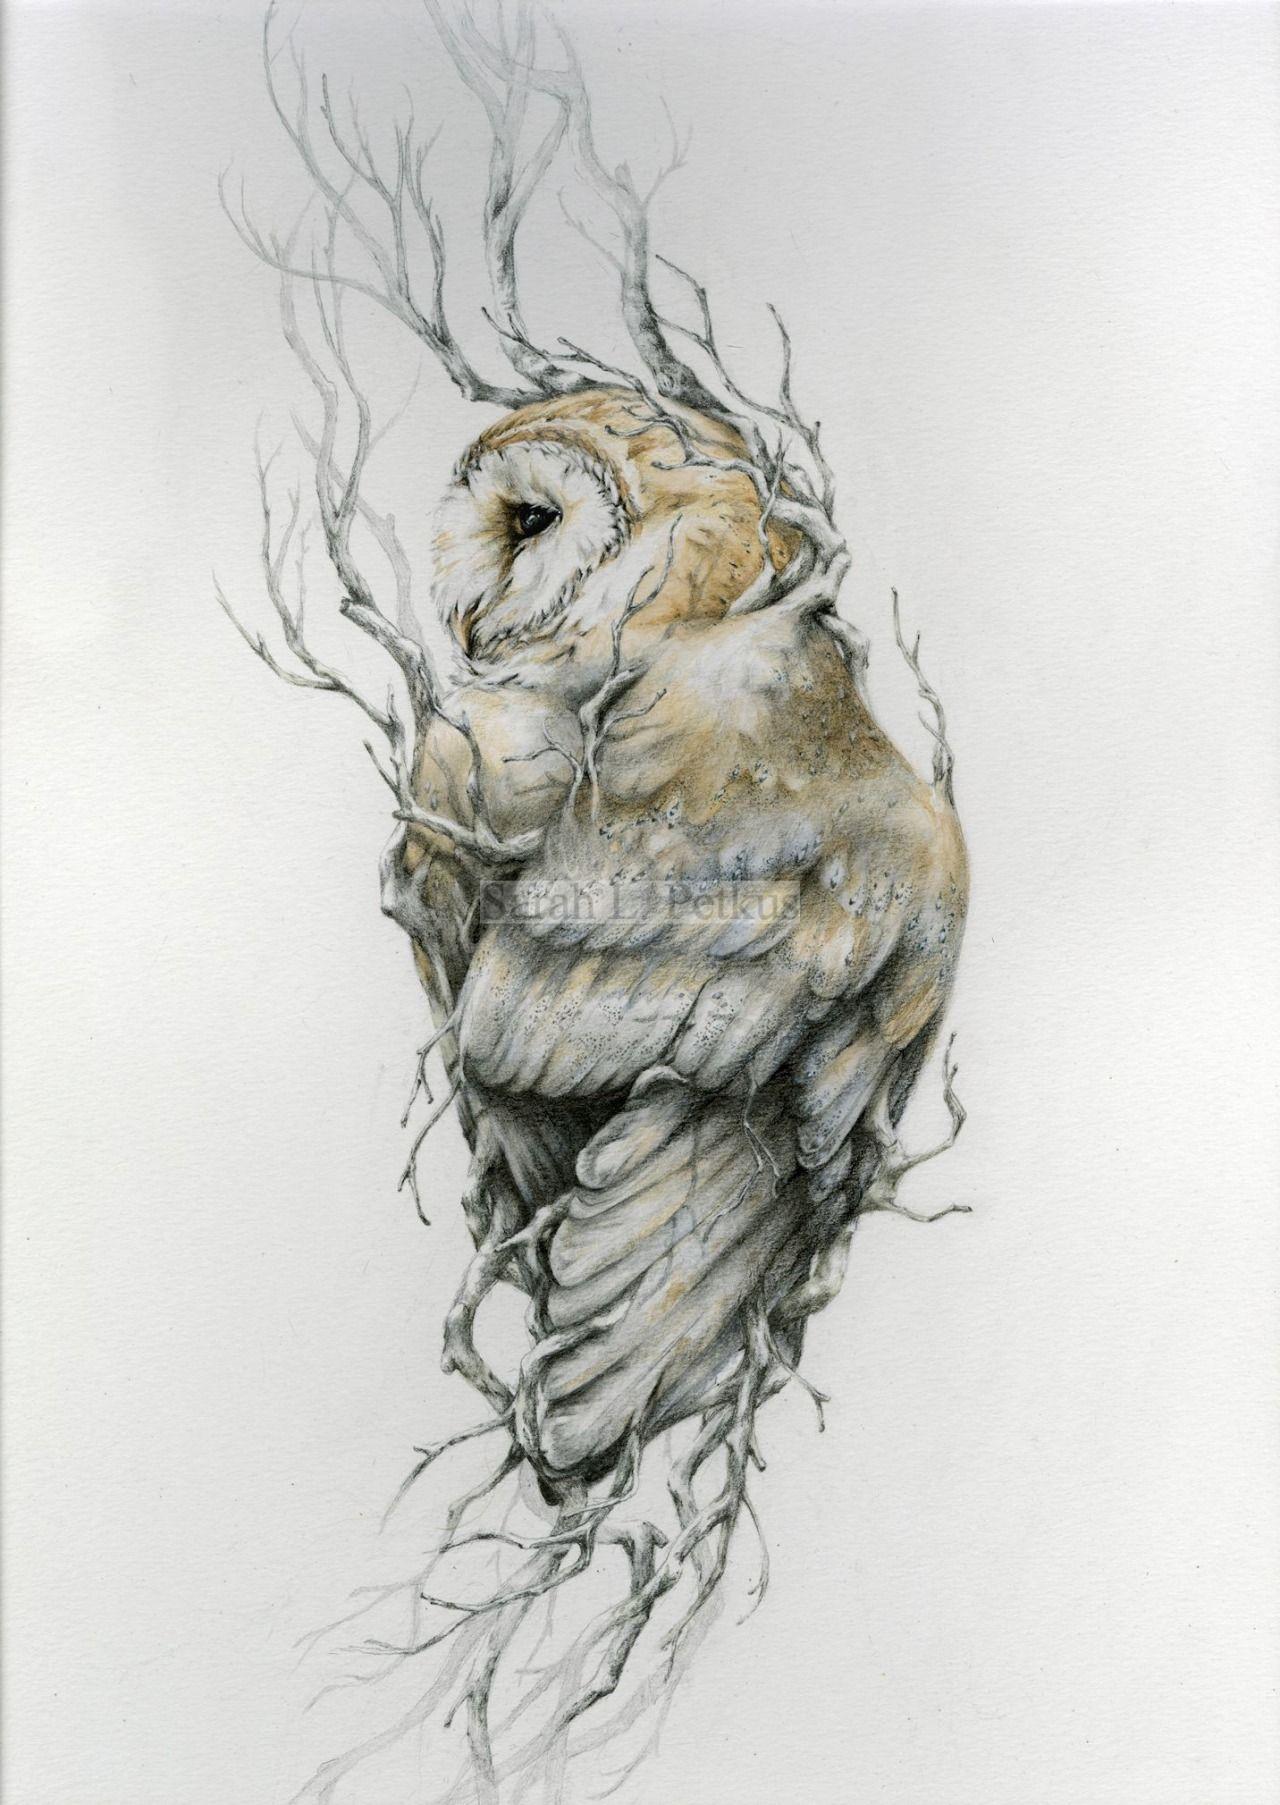 -Inextricable- by Sarah Leea Petkus//Nest & Burrow